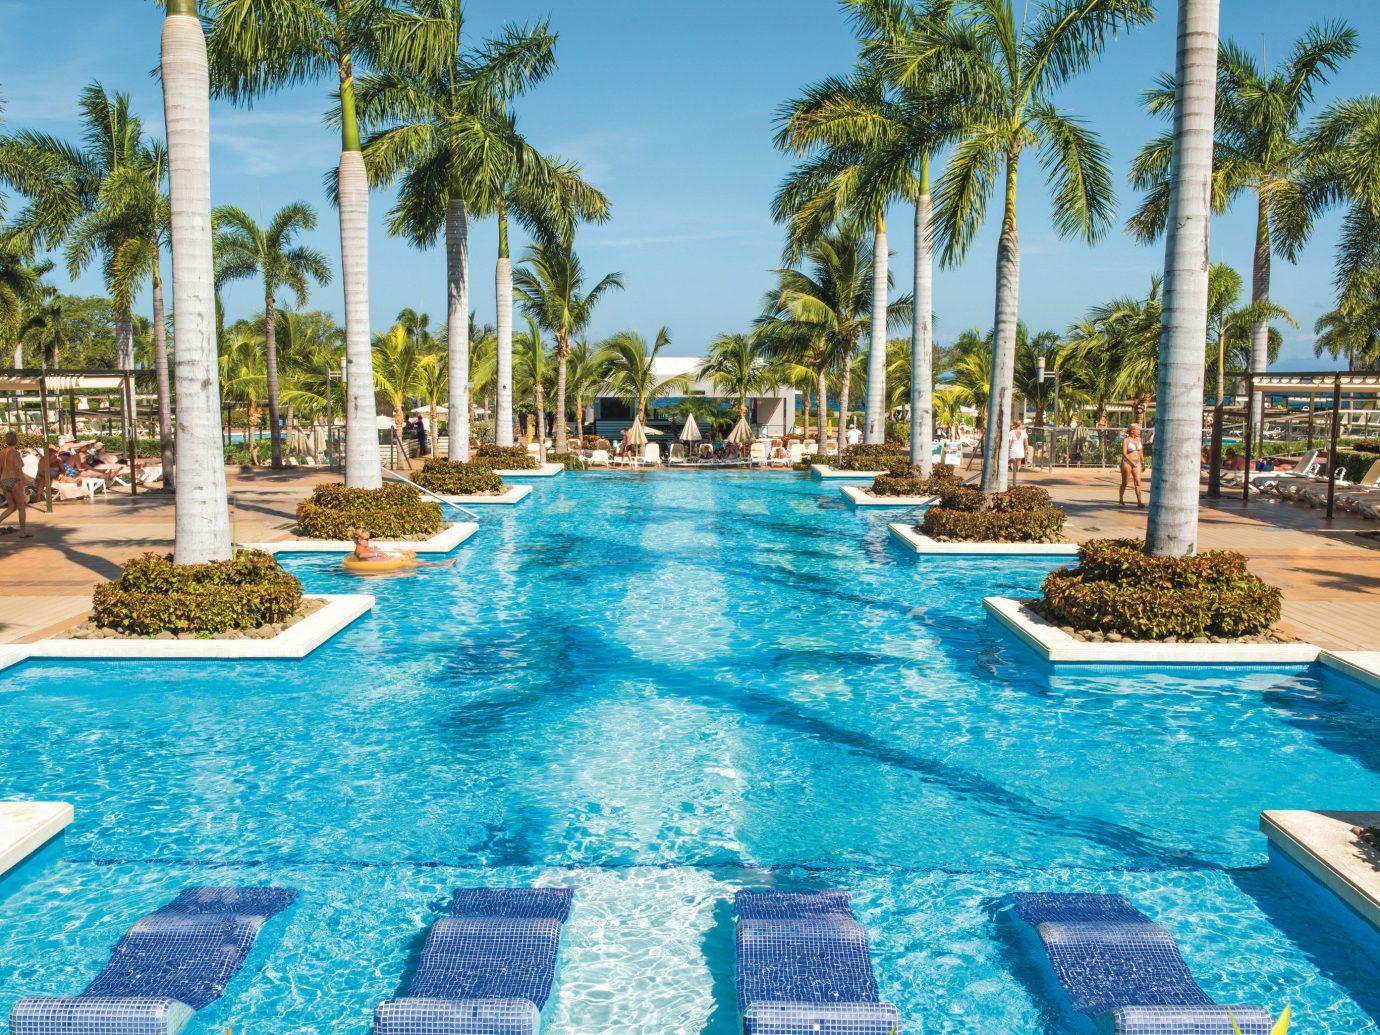 Pool at Hotel Riu Palace Costa Rica, Guanacaste